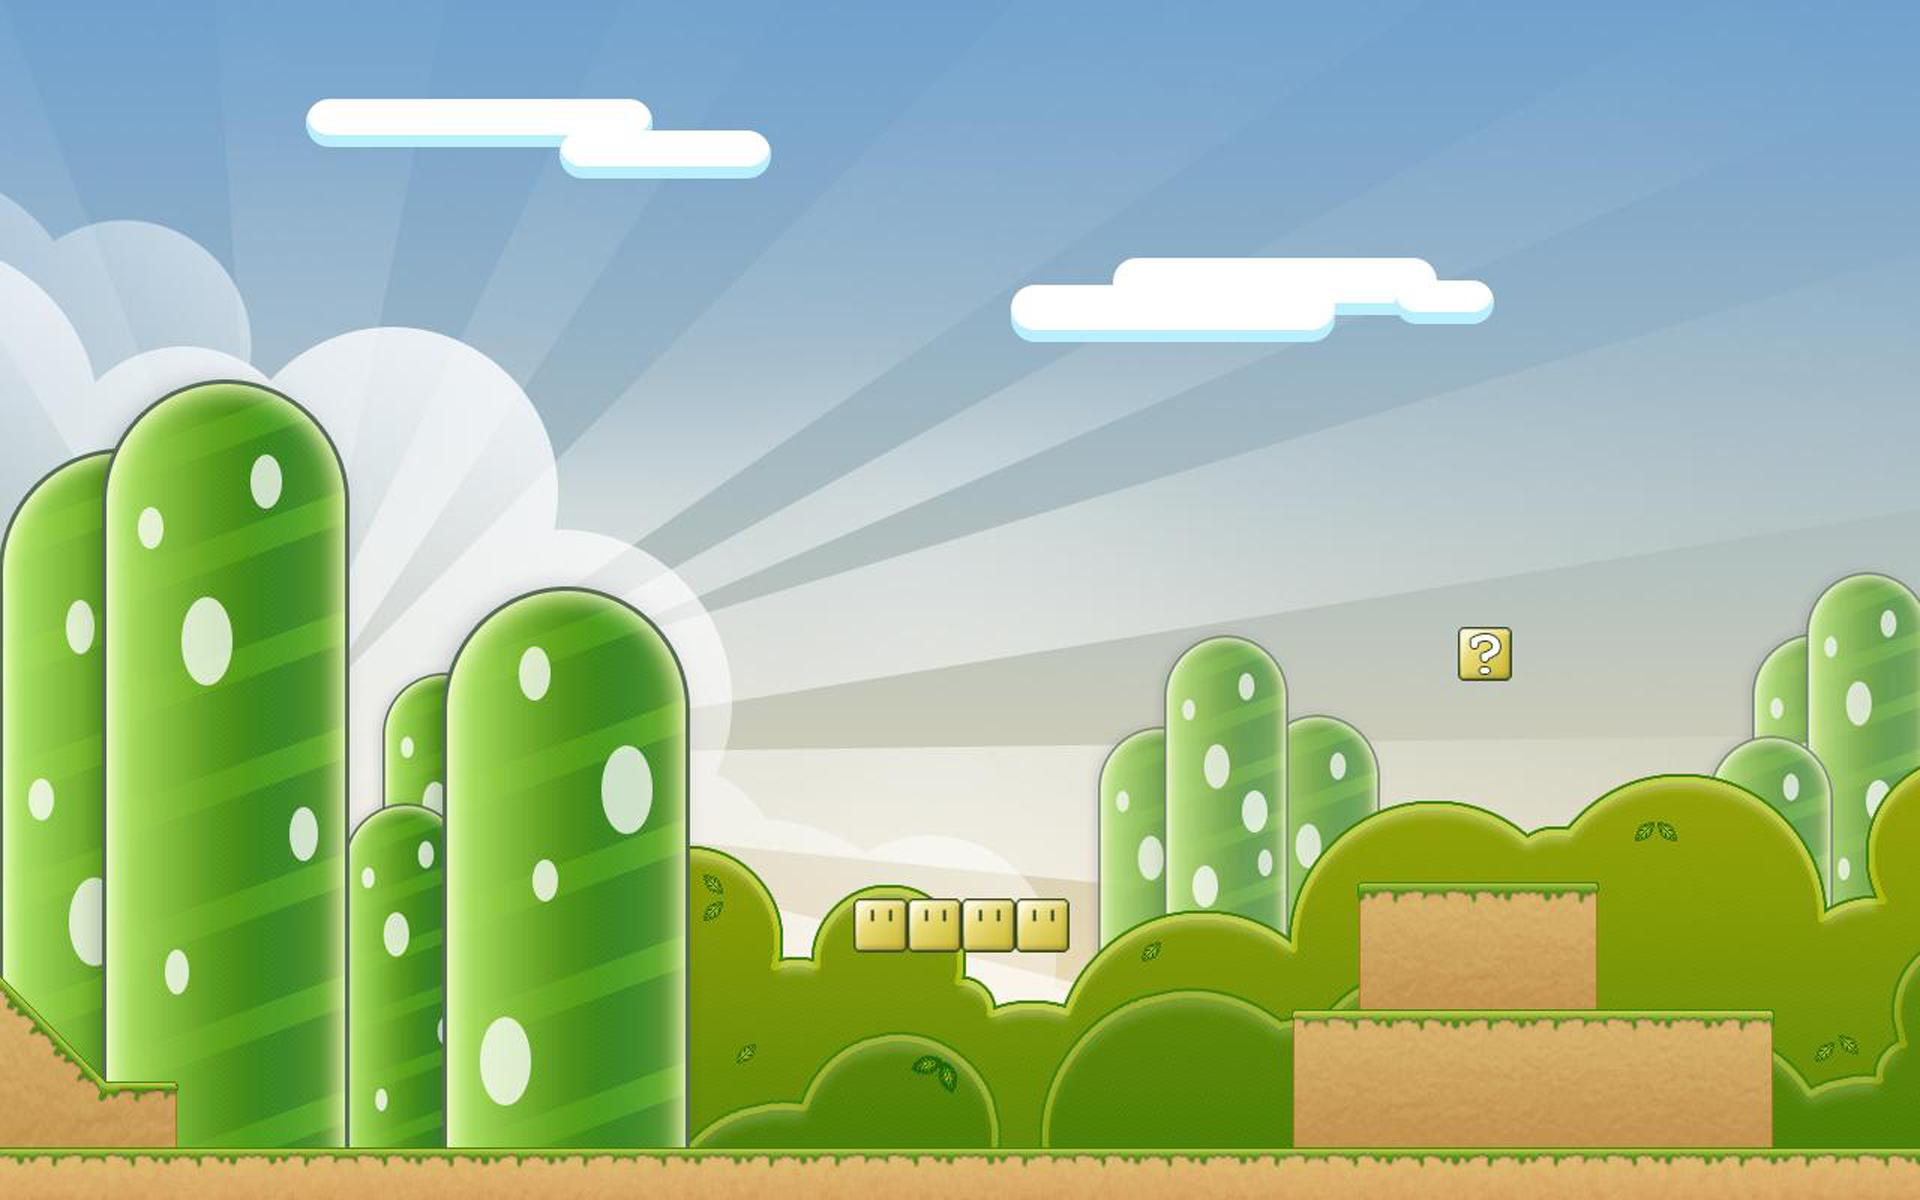 Super Mario Bros. - Super Mario Wiki, the Mario encyclopedia